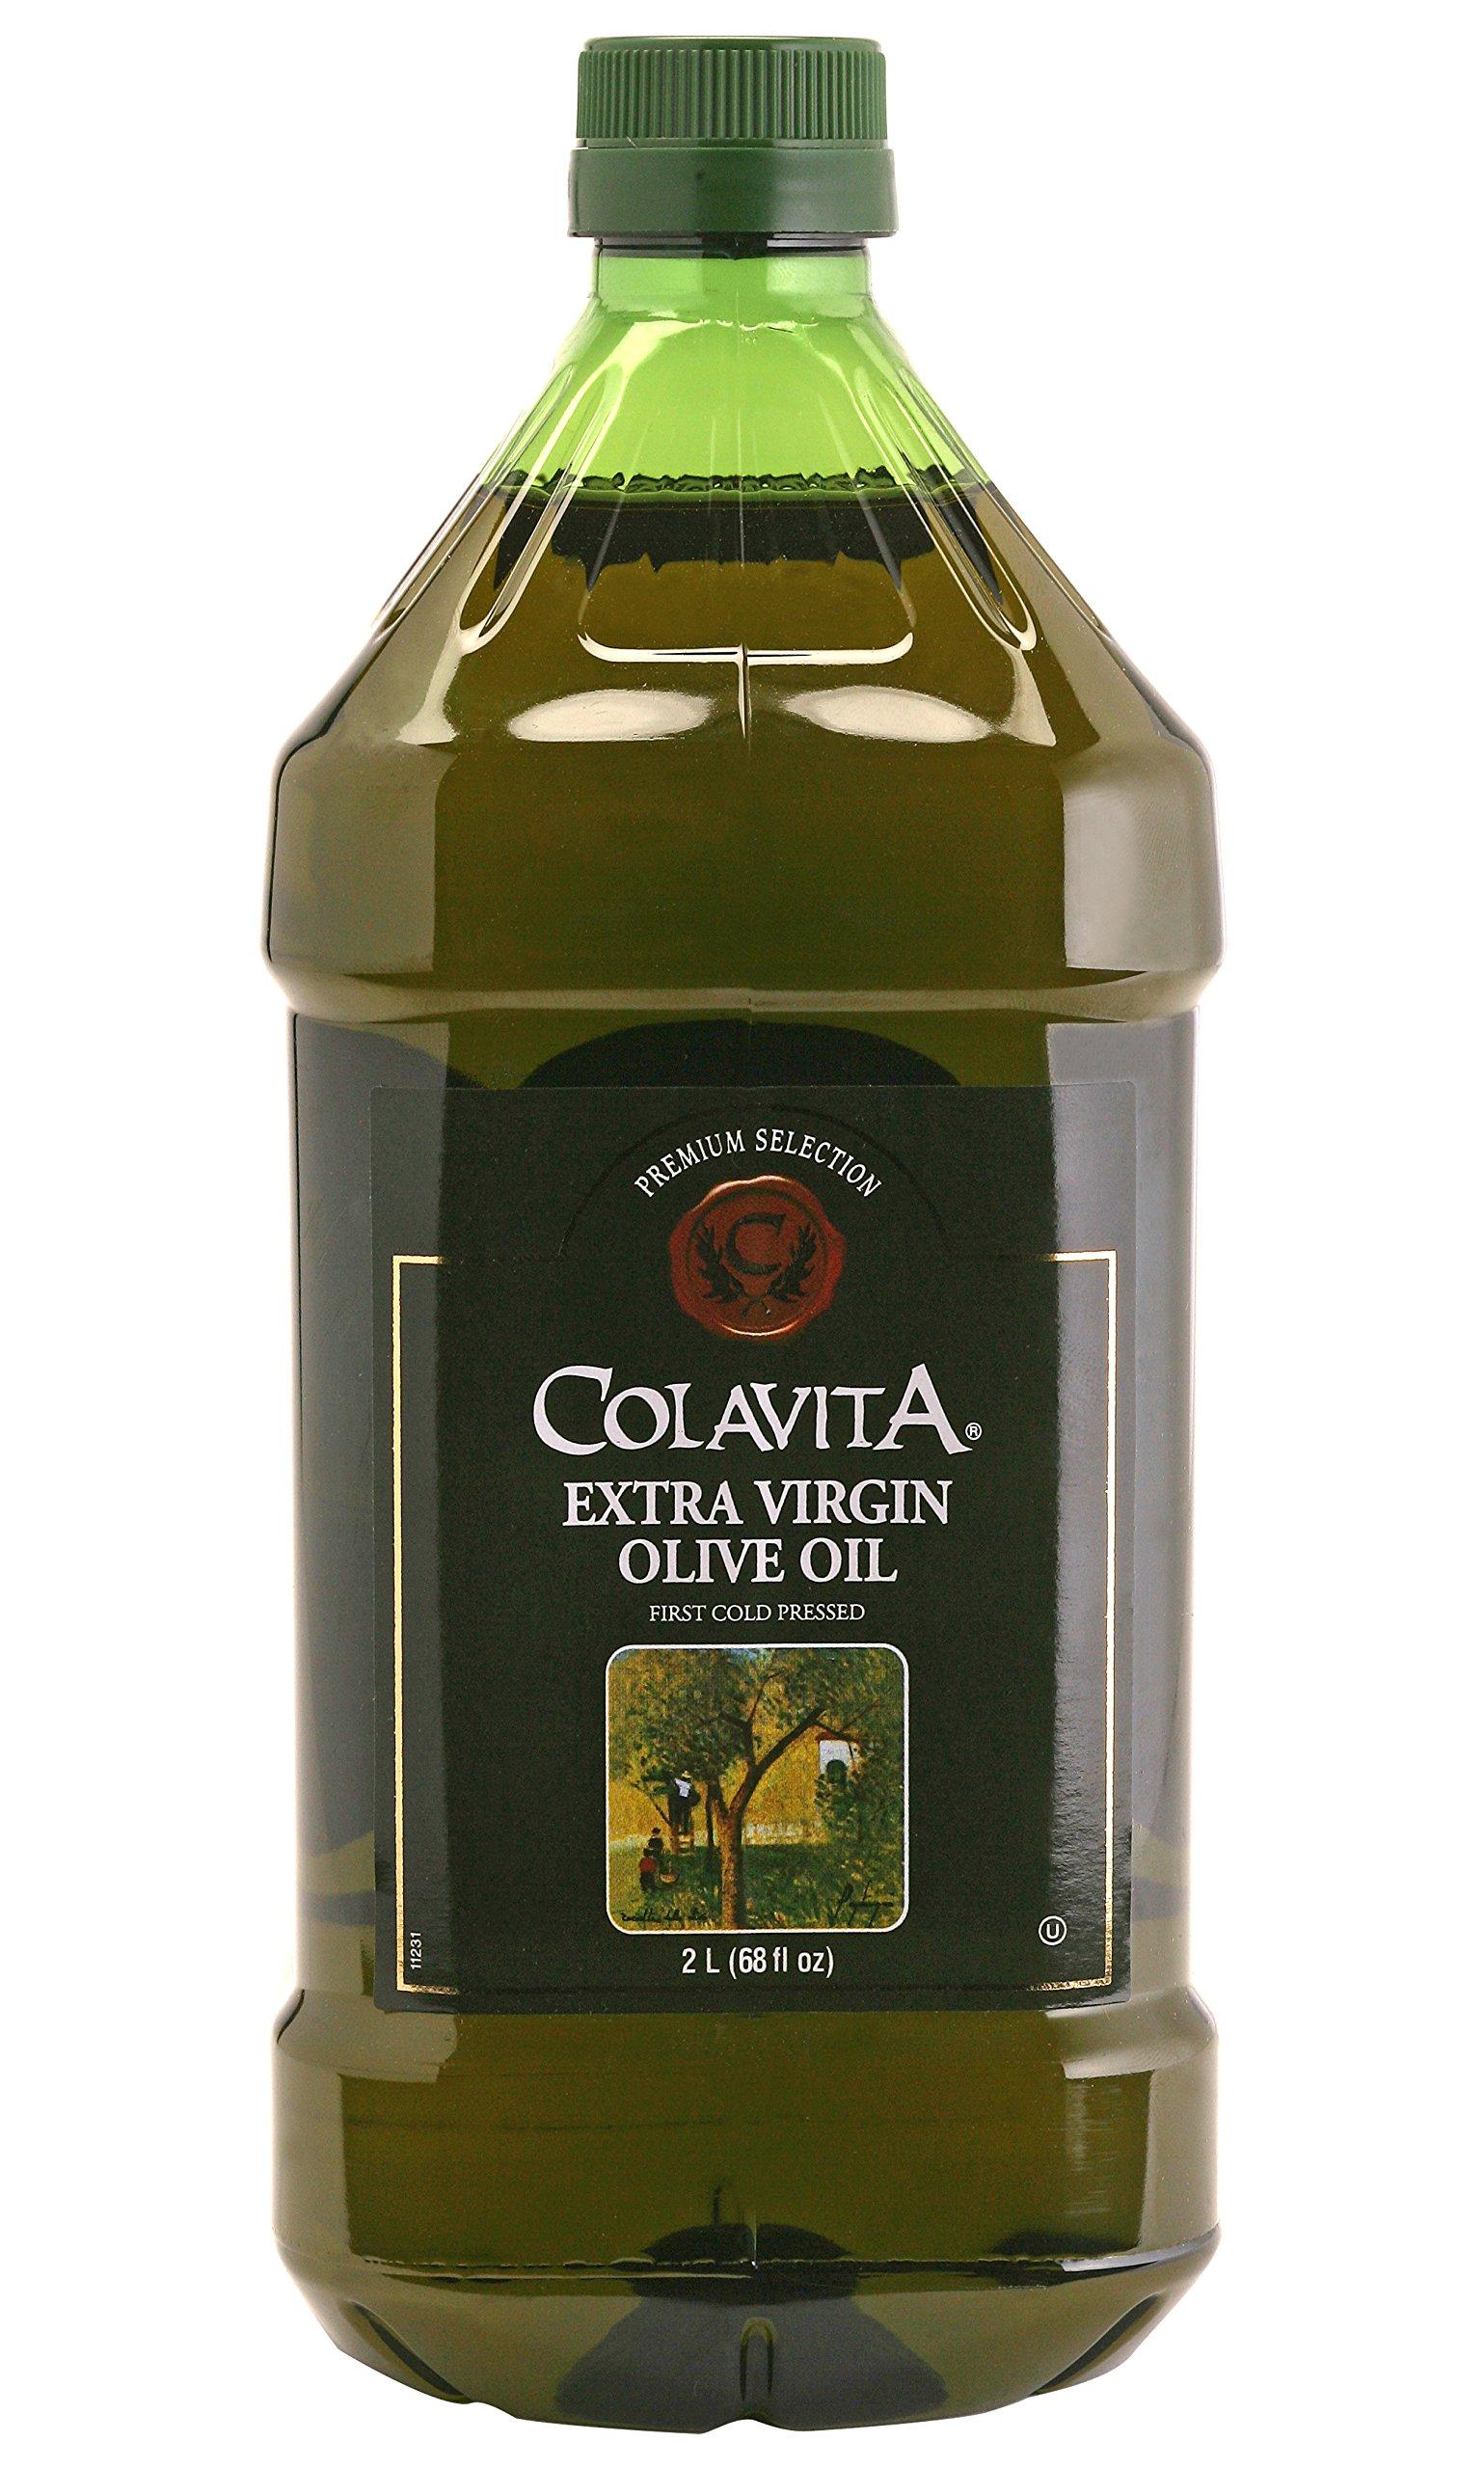 Colavita Extra Virgin Olive Oil, 2 liters